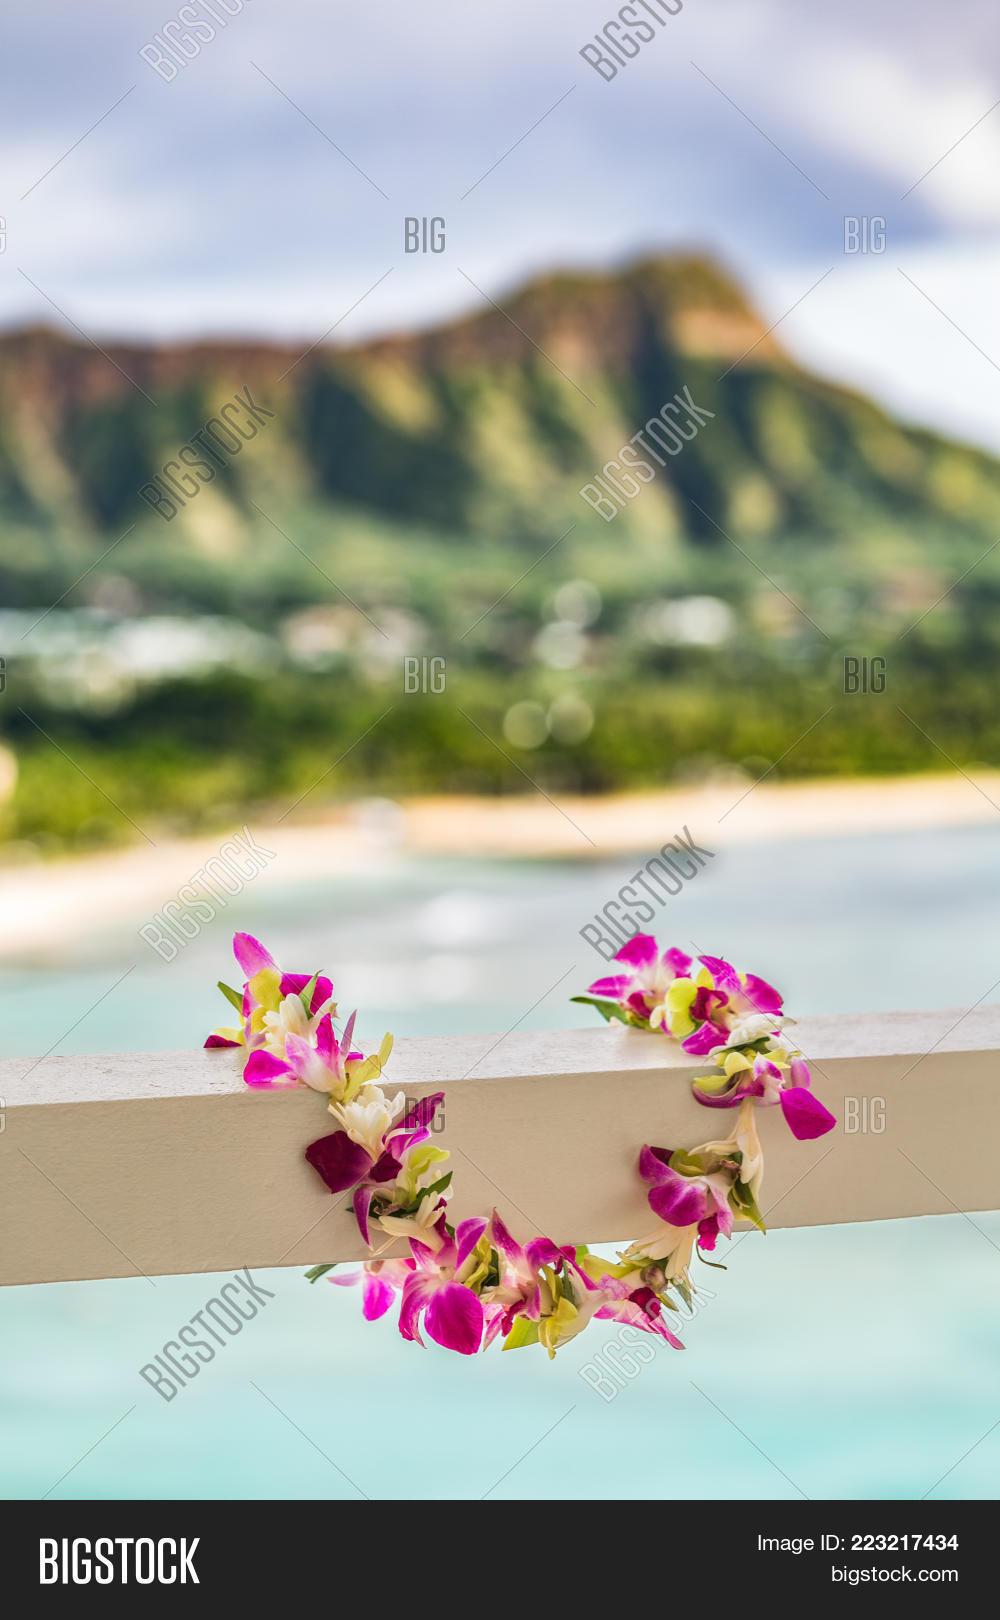 Hawaii Travel Image Photo Free Trial Bigstock